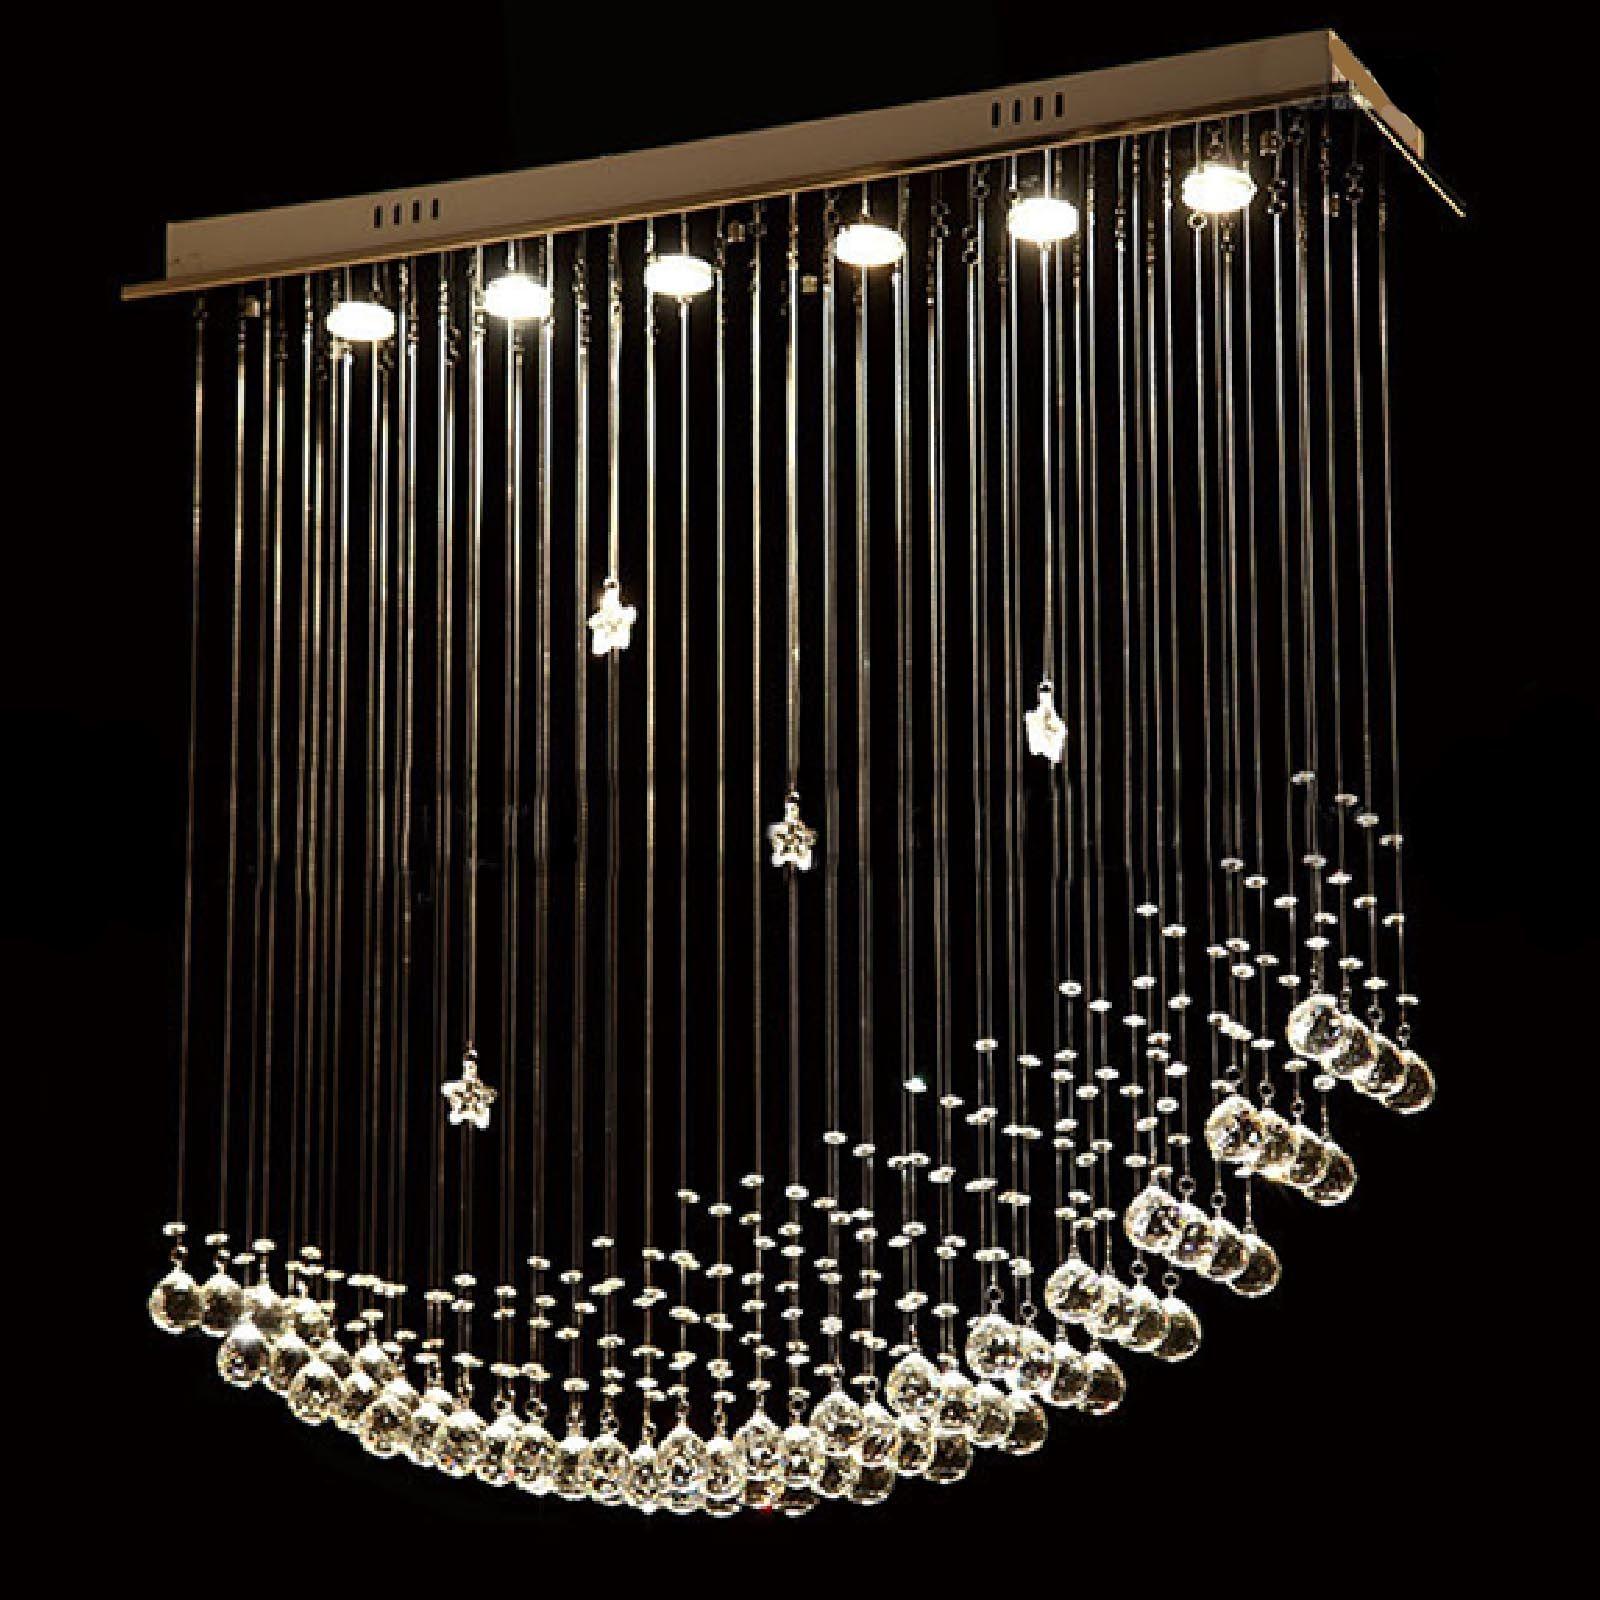 BYB® Modern Chandelier Rain Drop Lighting Crystal Ball Fixture Pendant  Ceiling Lamp, Moon U0026